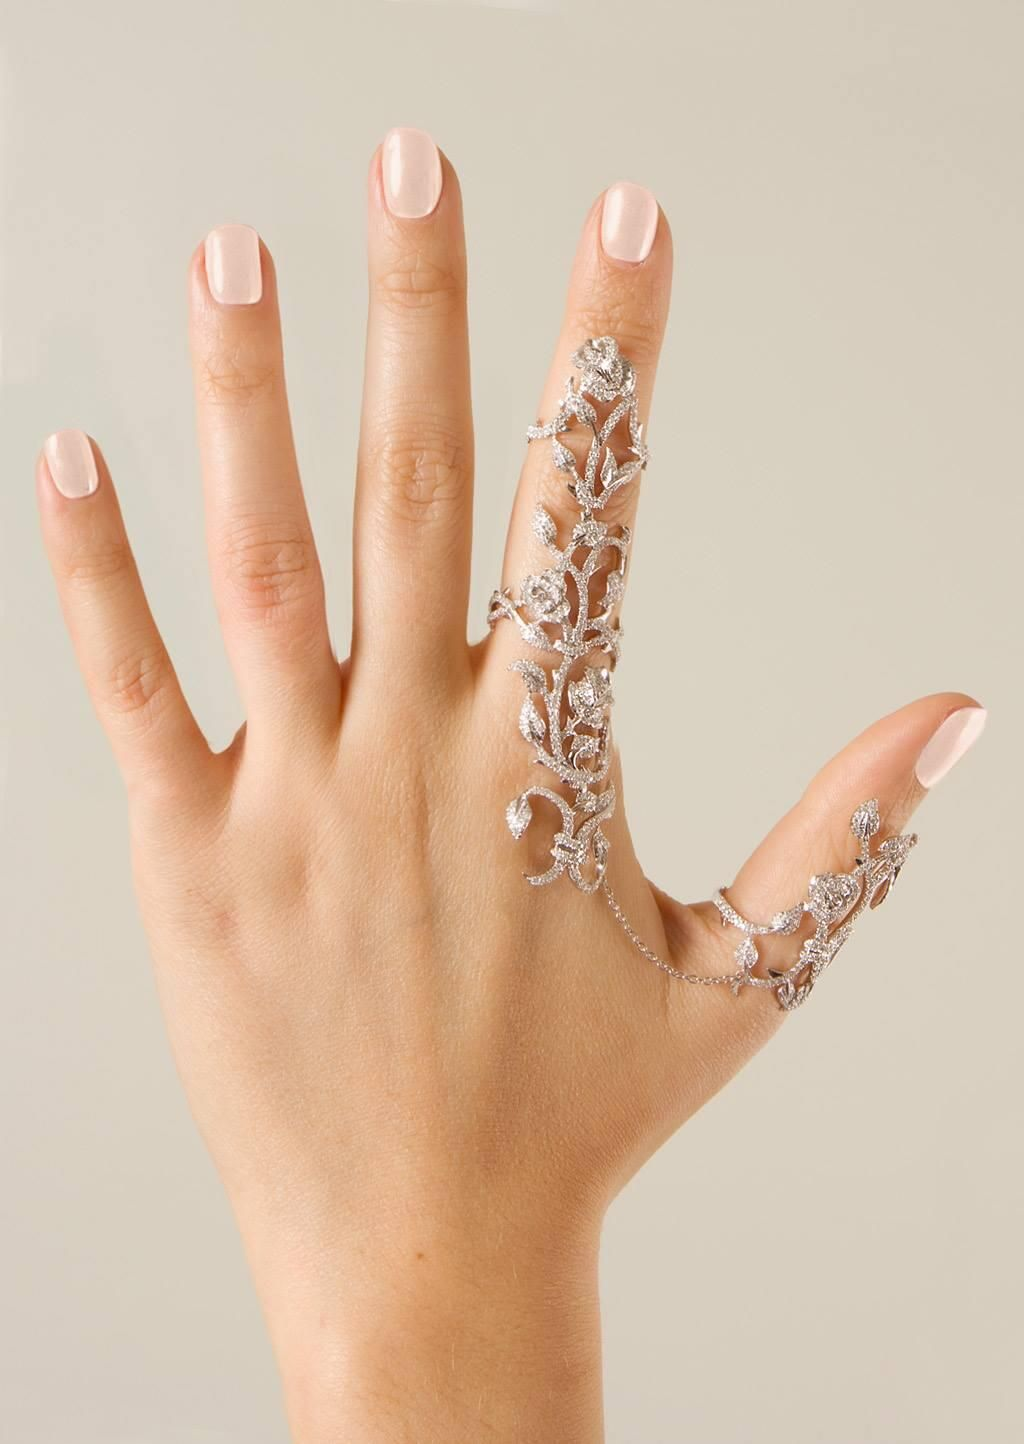 Damen Ring Hochzeit Ring Elegant strass Fingerring Partnerringe Legierungen Ring